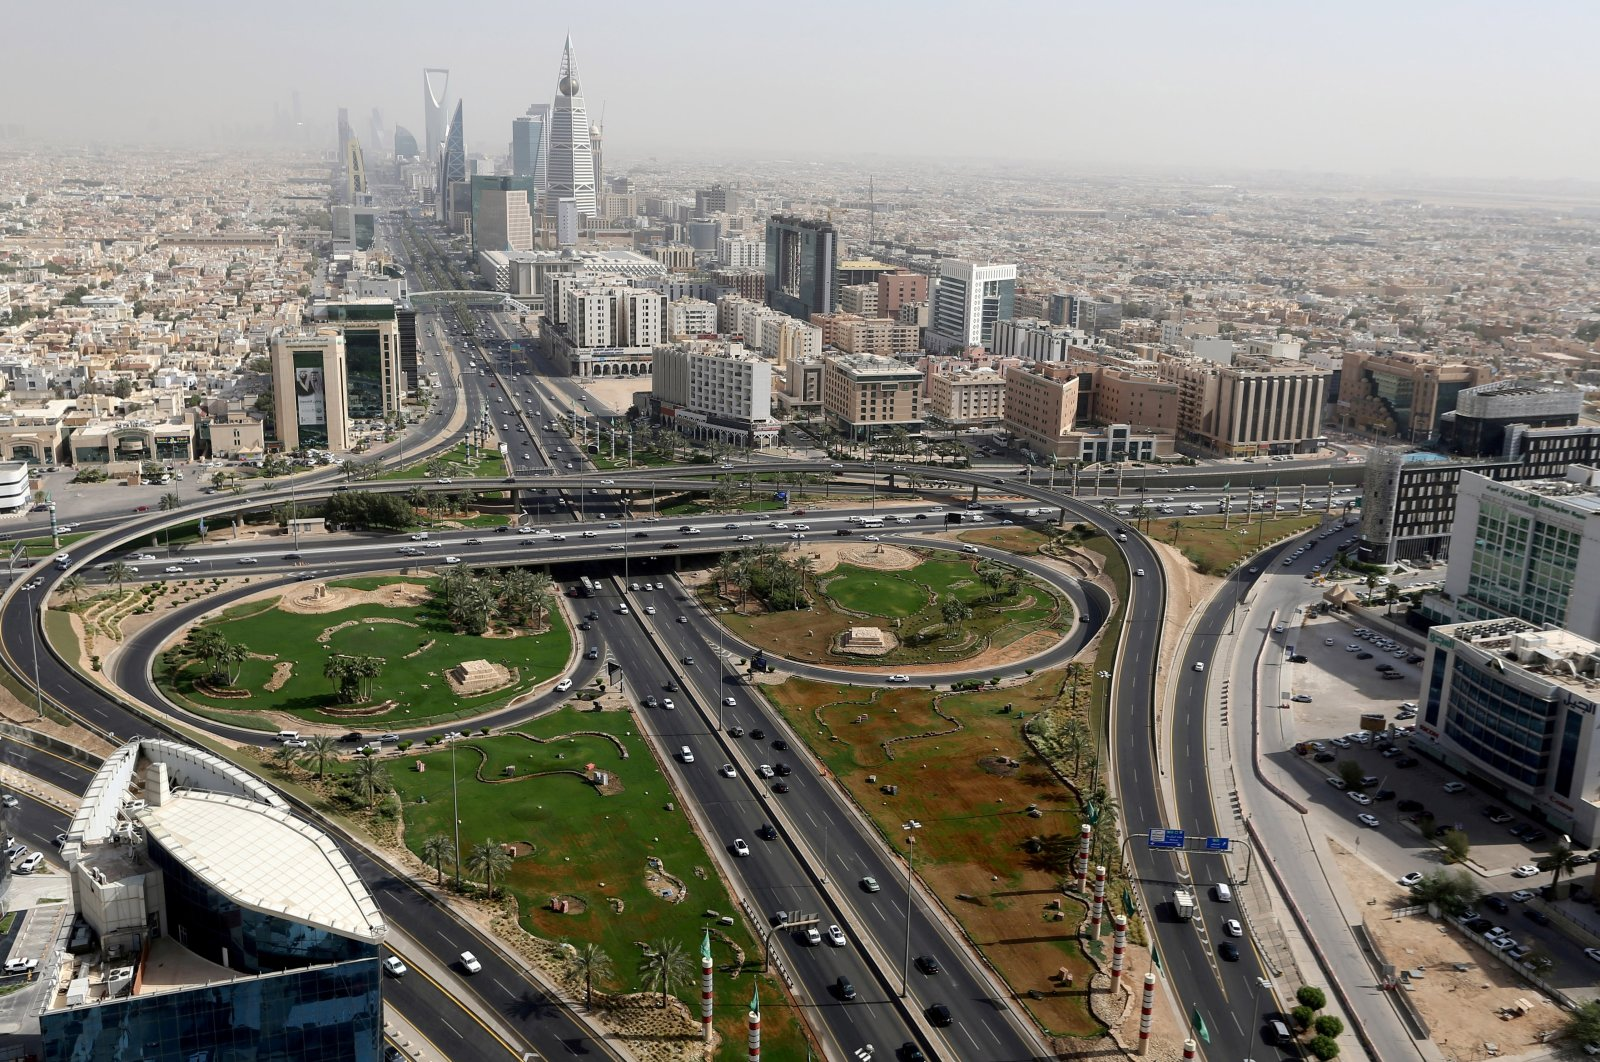 A general view of Riyadh, Saudi Arabia, June 21, 2020. (Reuters Photo)